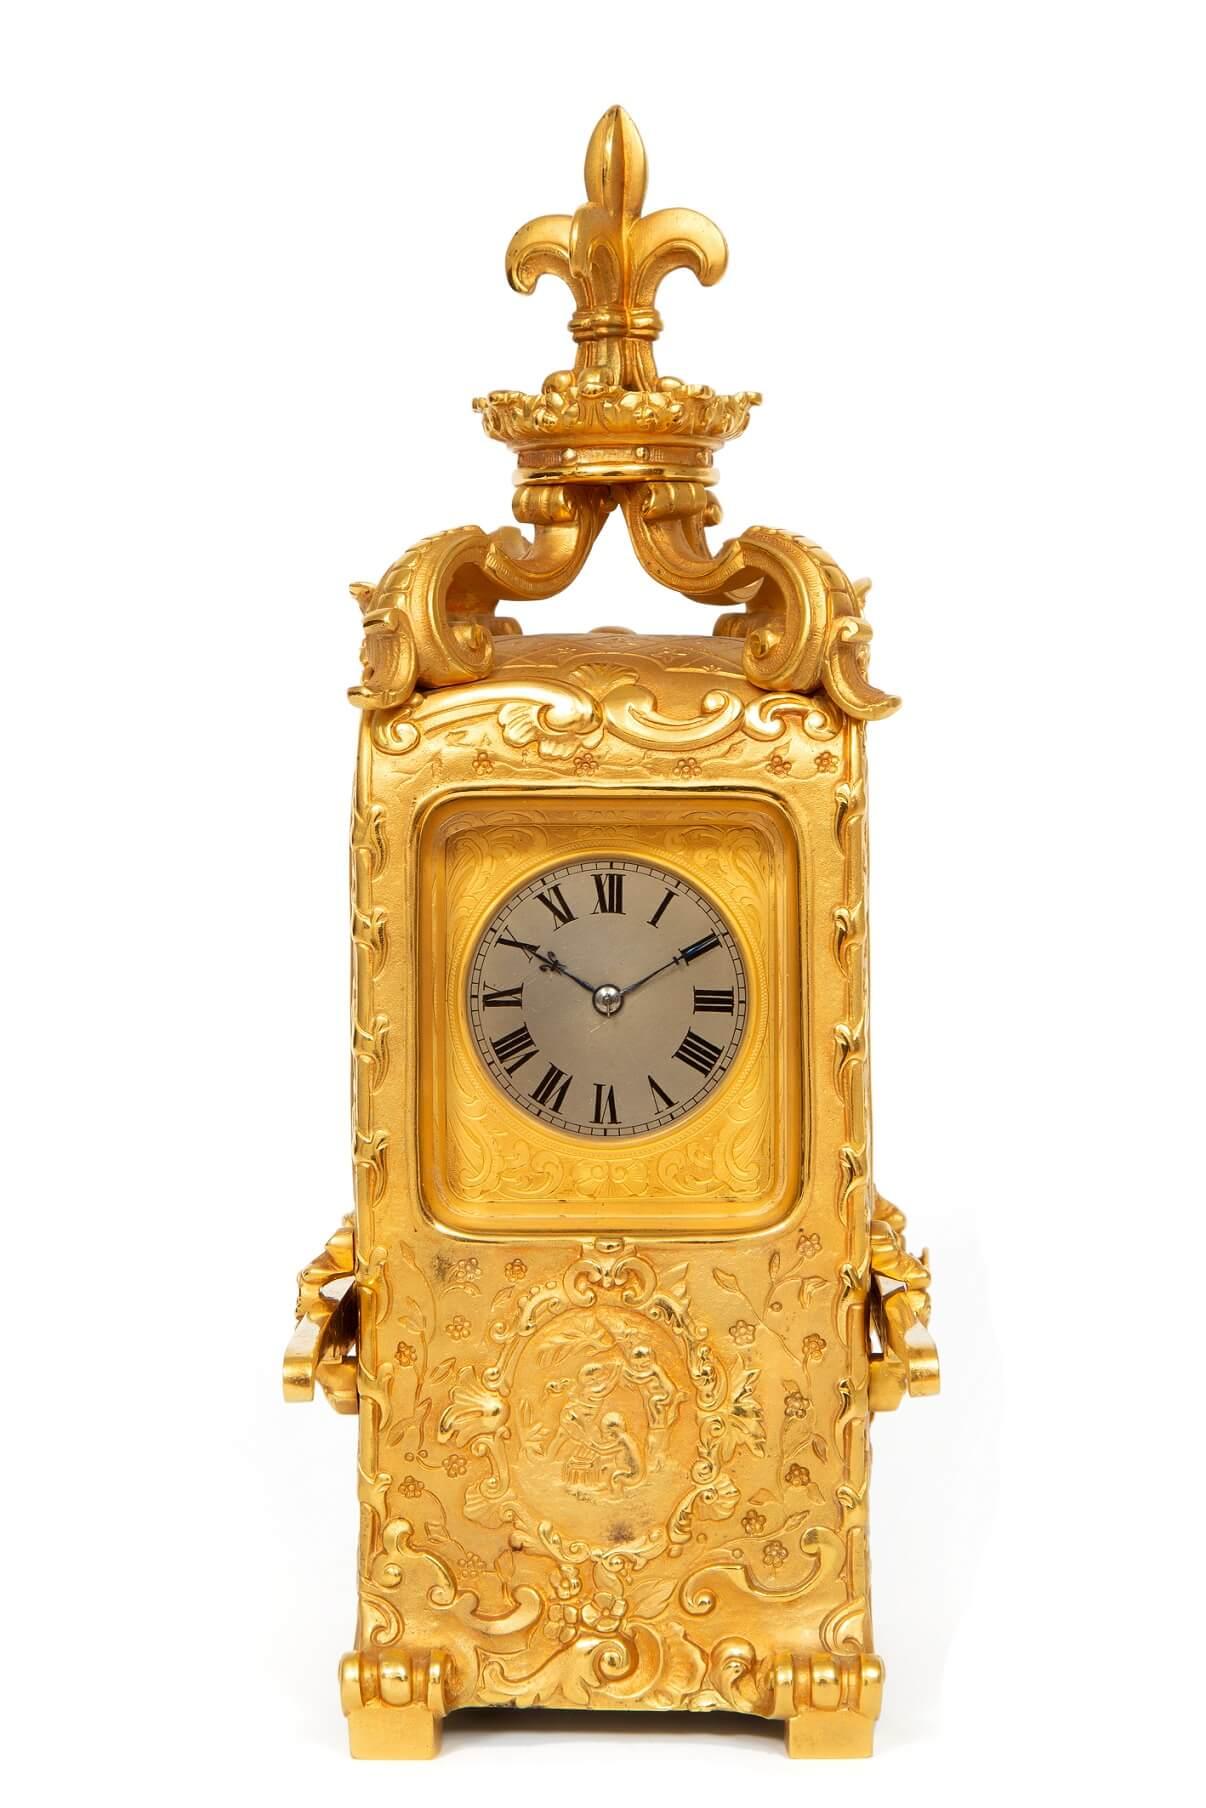 French Sedan Carriage Clock 4 152